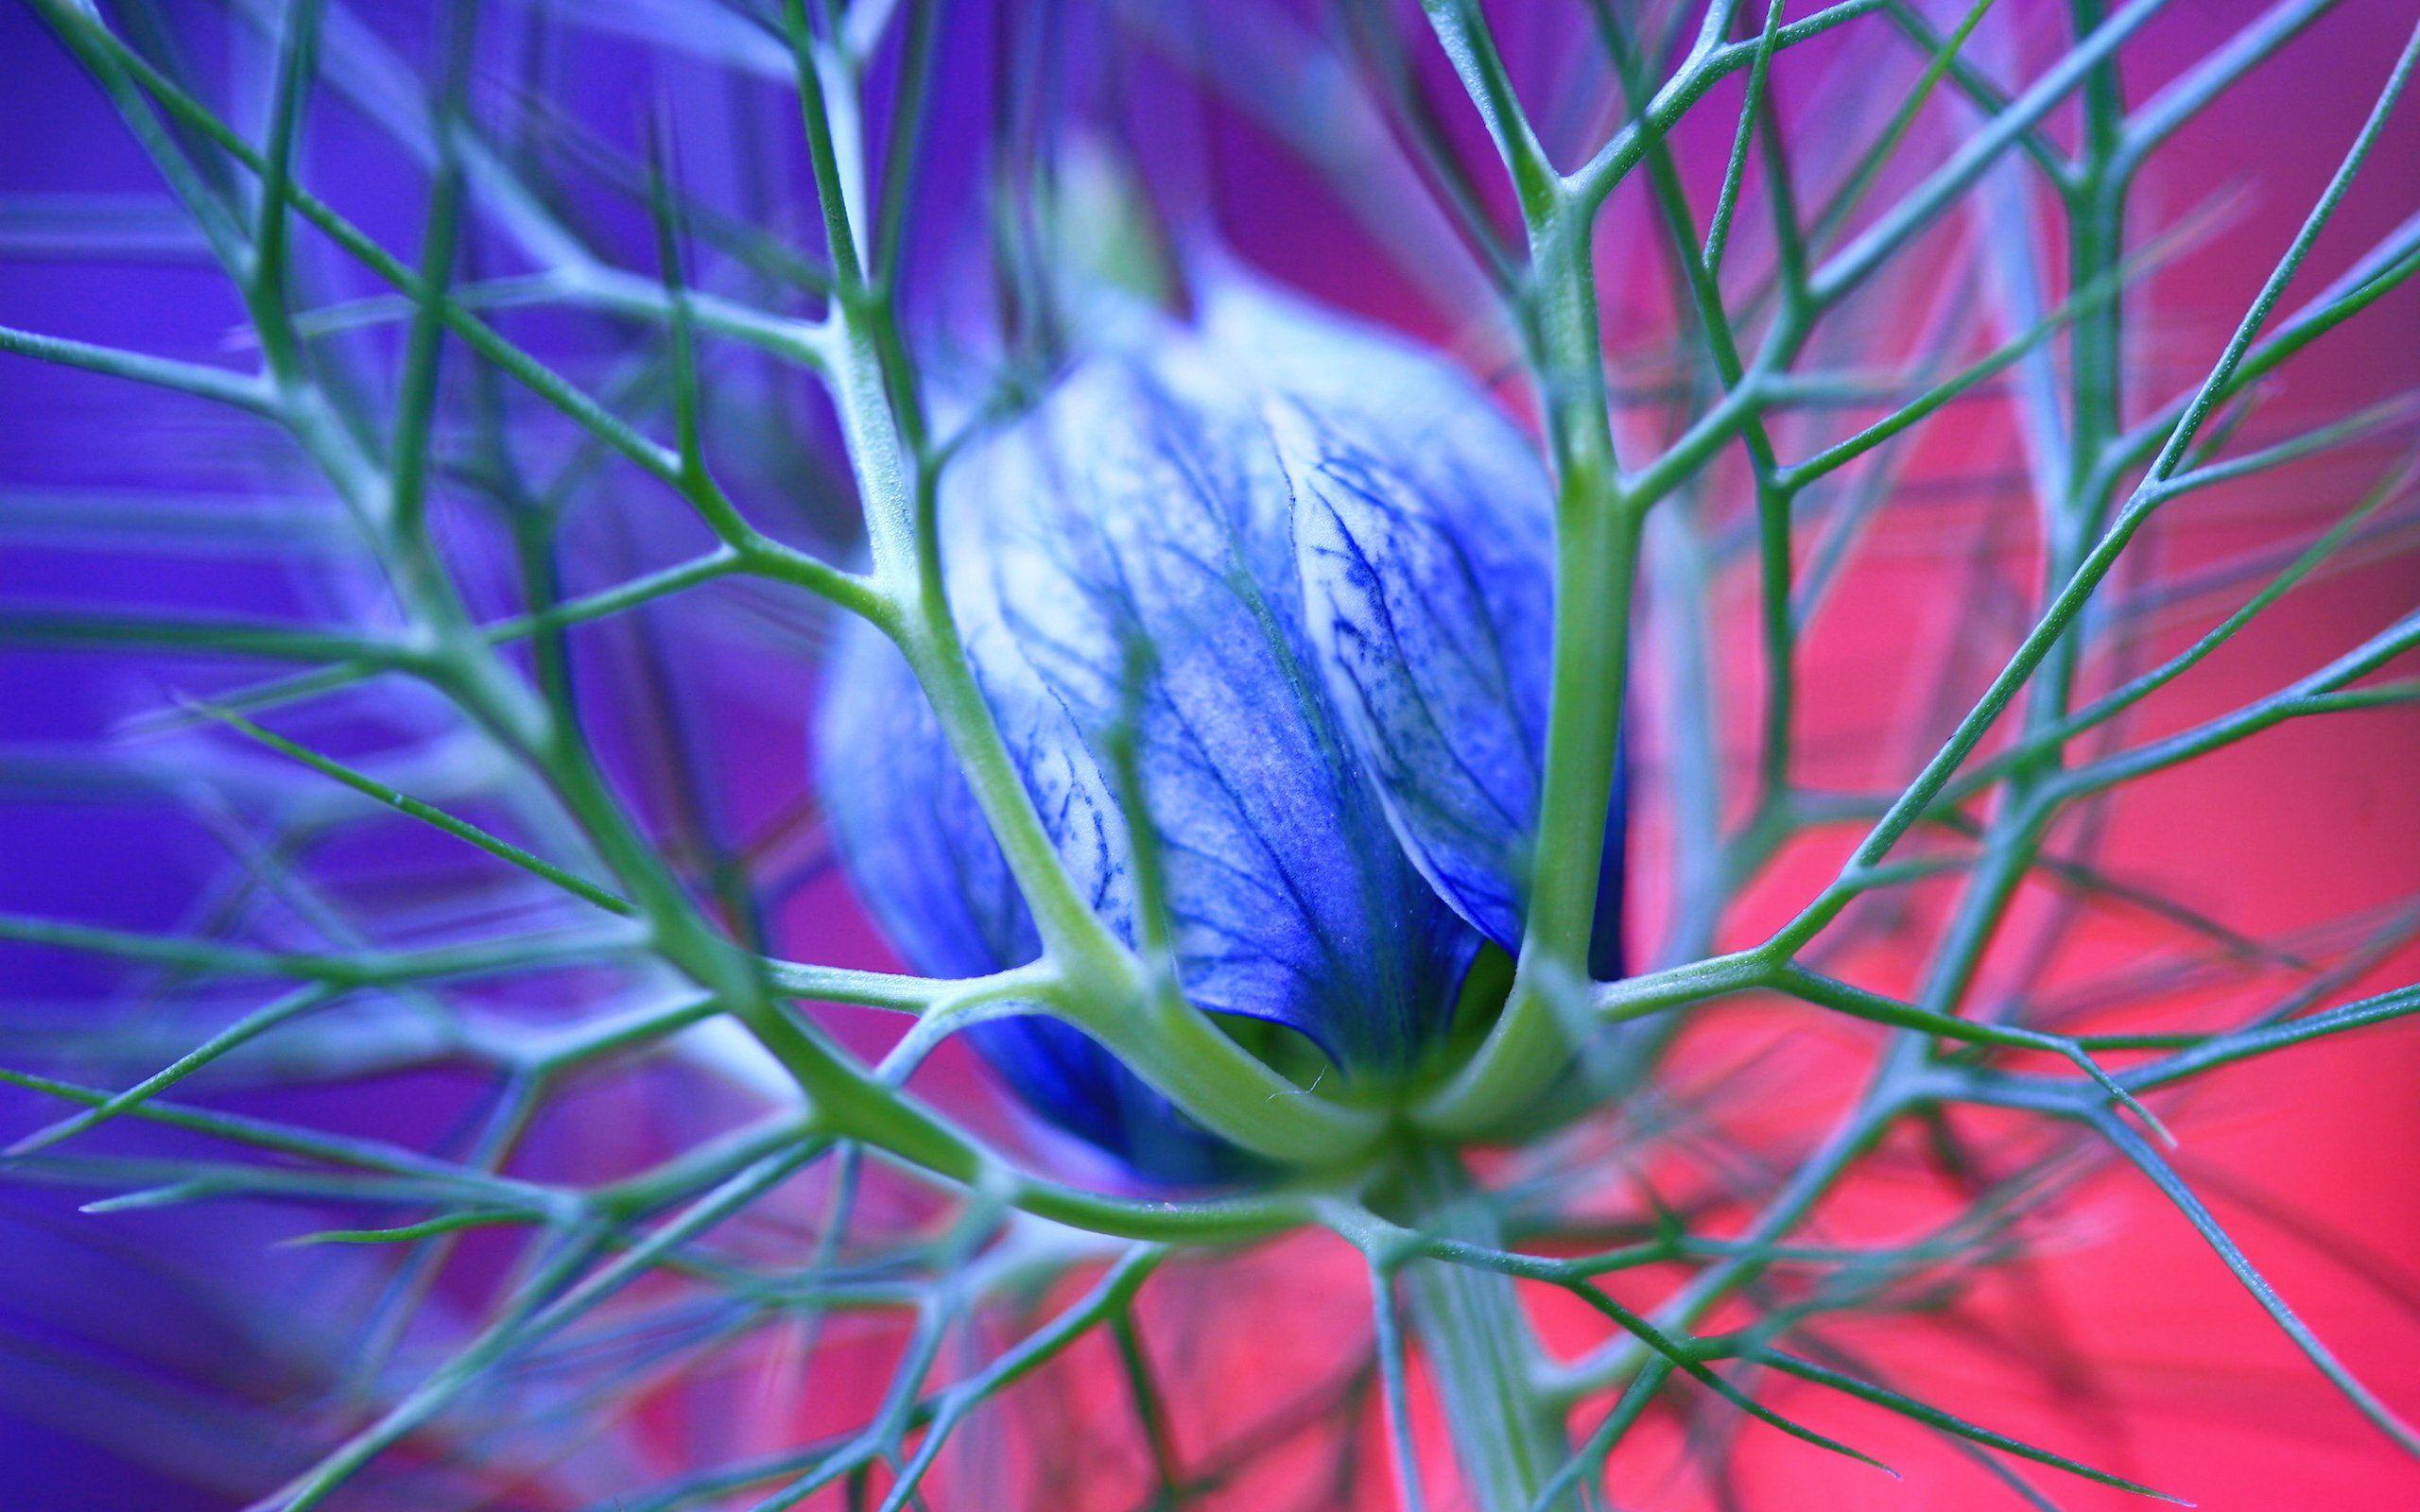 Pinkflowerpicturesandnames nature sea wood flowers hq blue flowers thorns ipad wallpaper ilikewallpaper com blue izmirmasajfo